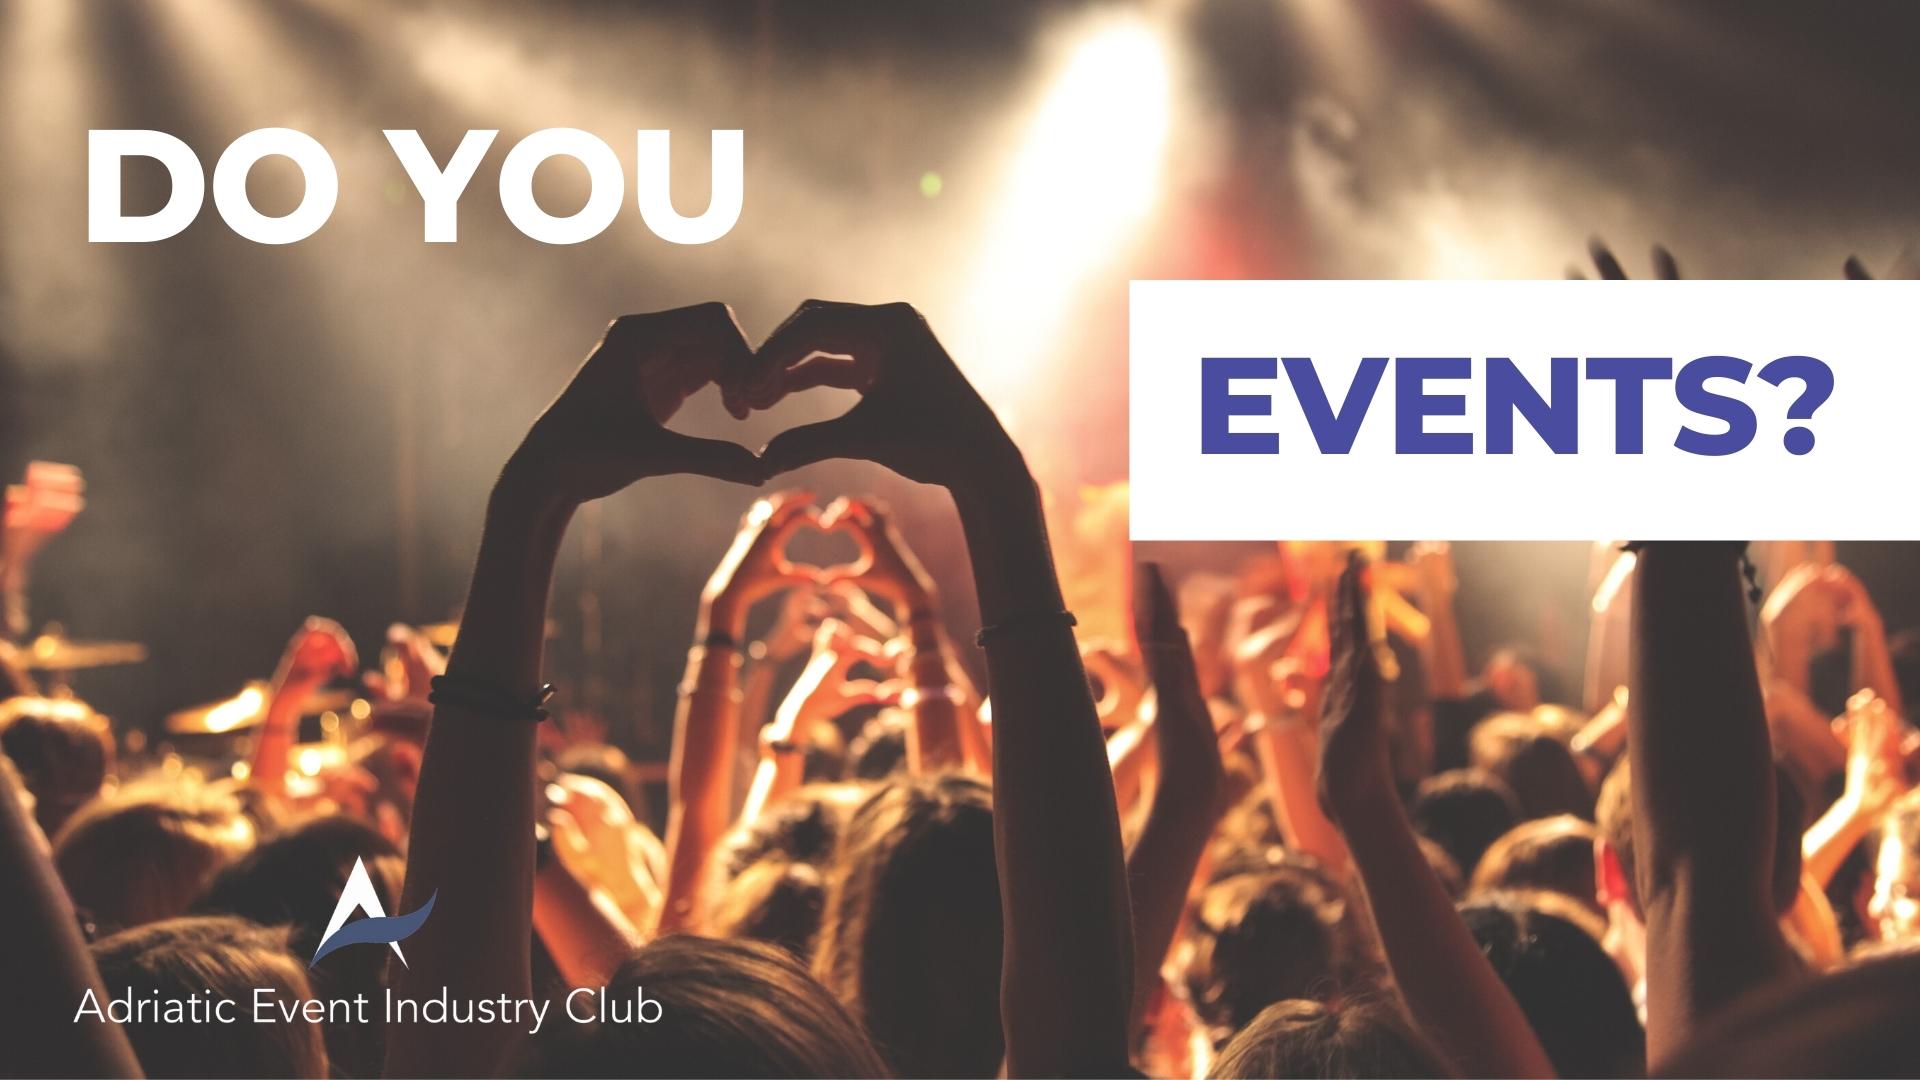 adriatic-event-industry-club